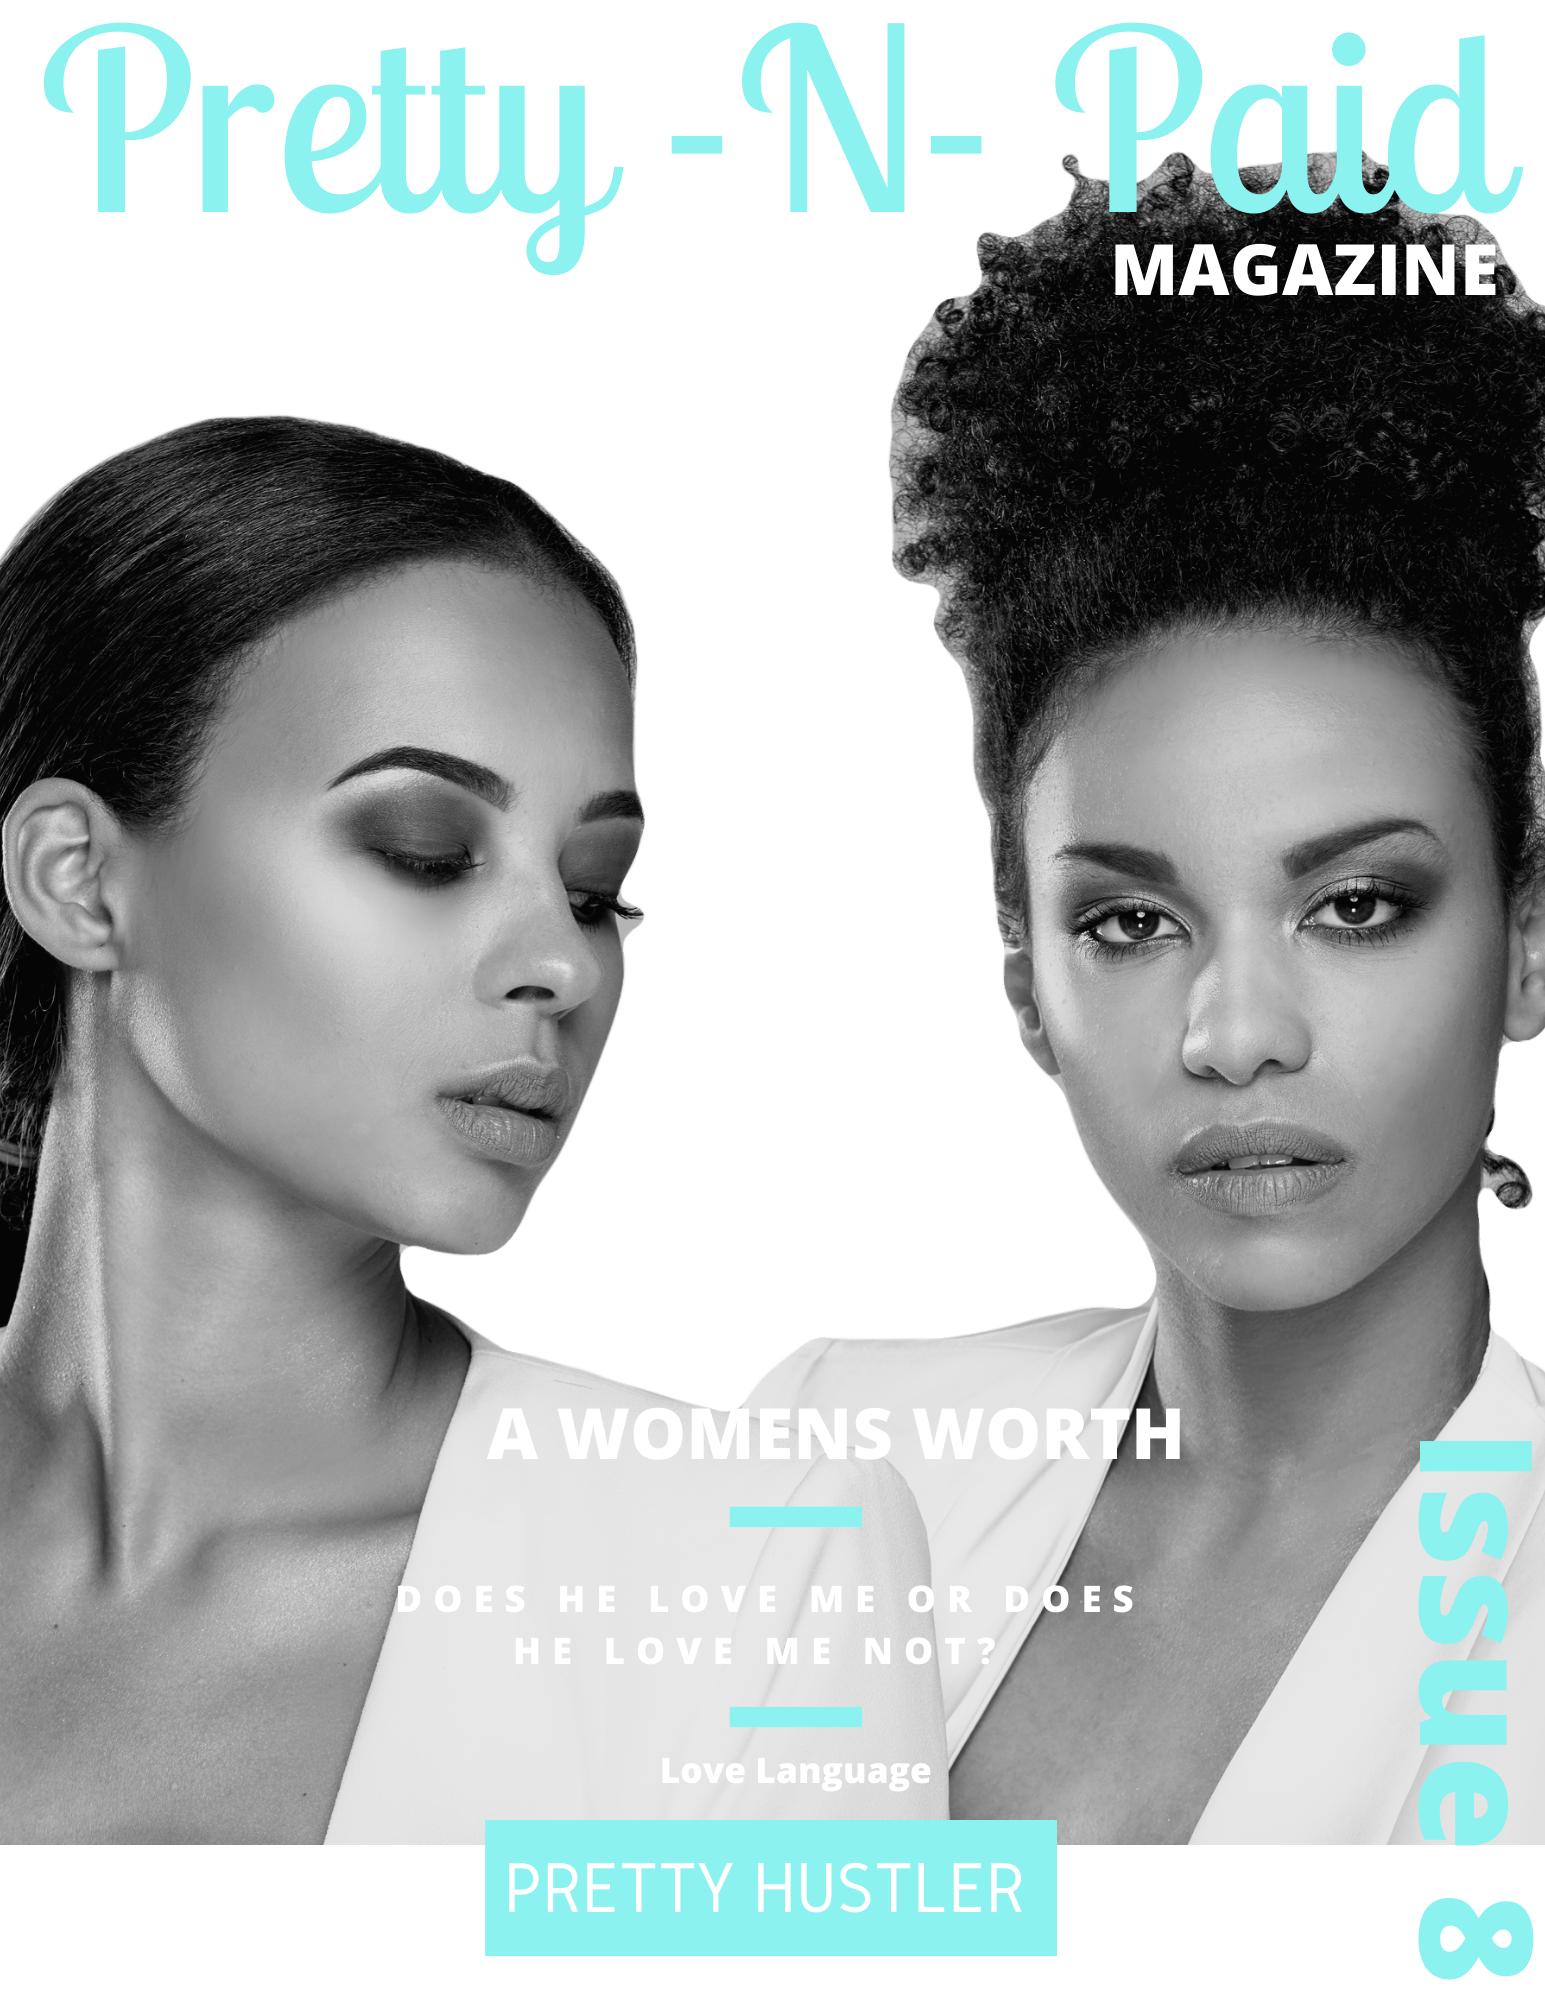 Aqua Greyscale Teen Magazine Cover